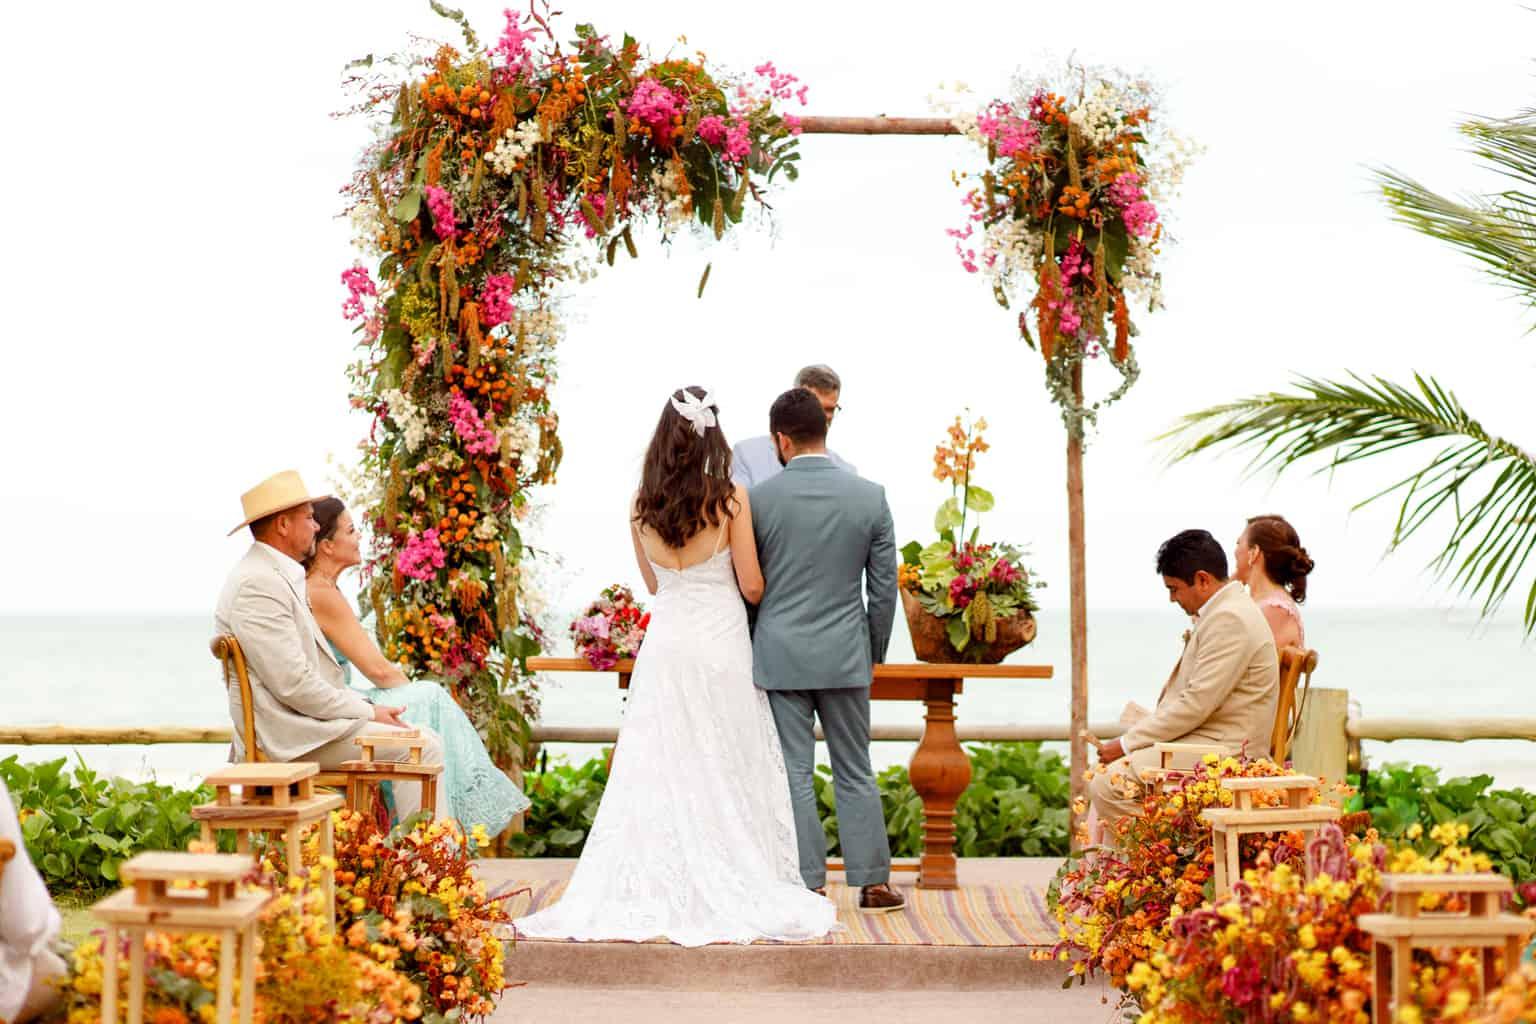 Casamento-Emanuelle-e-Alysson-Fotografia-Tadeu-Nanó-e-Luca-Antunes87